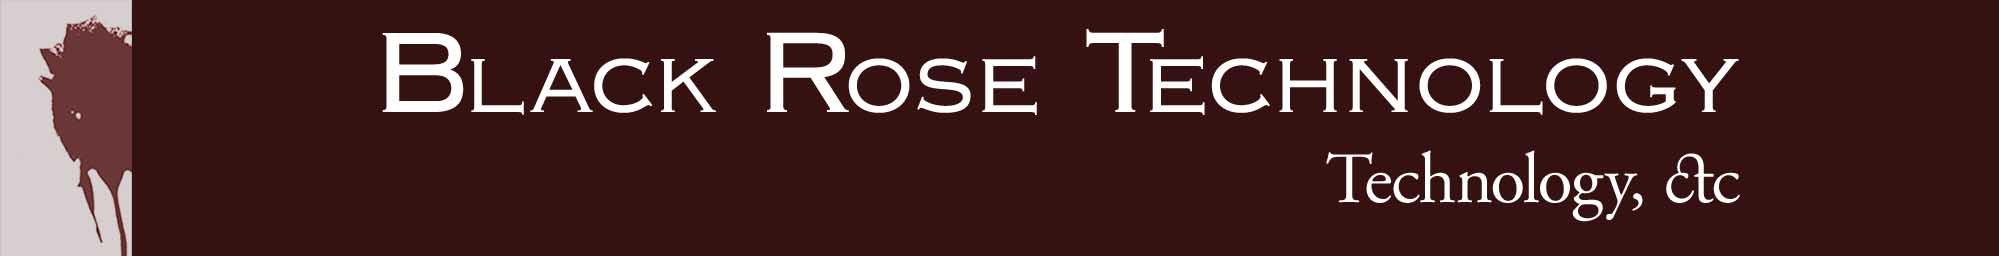 Black Rose Technology, LLC